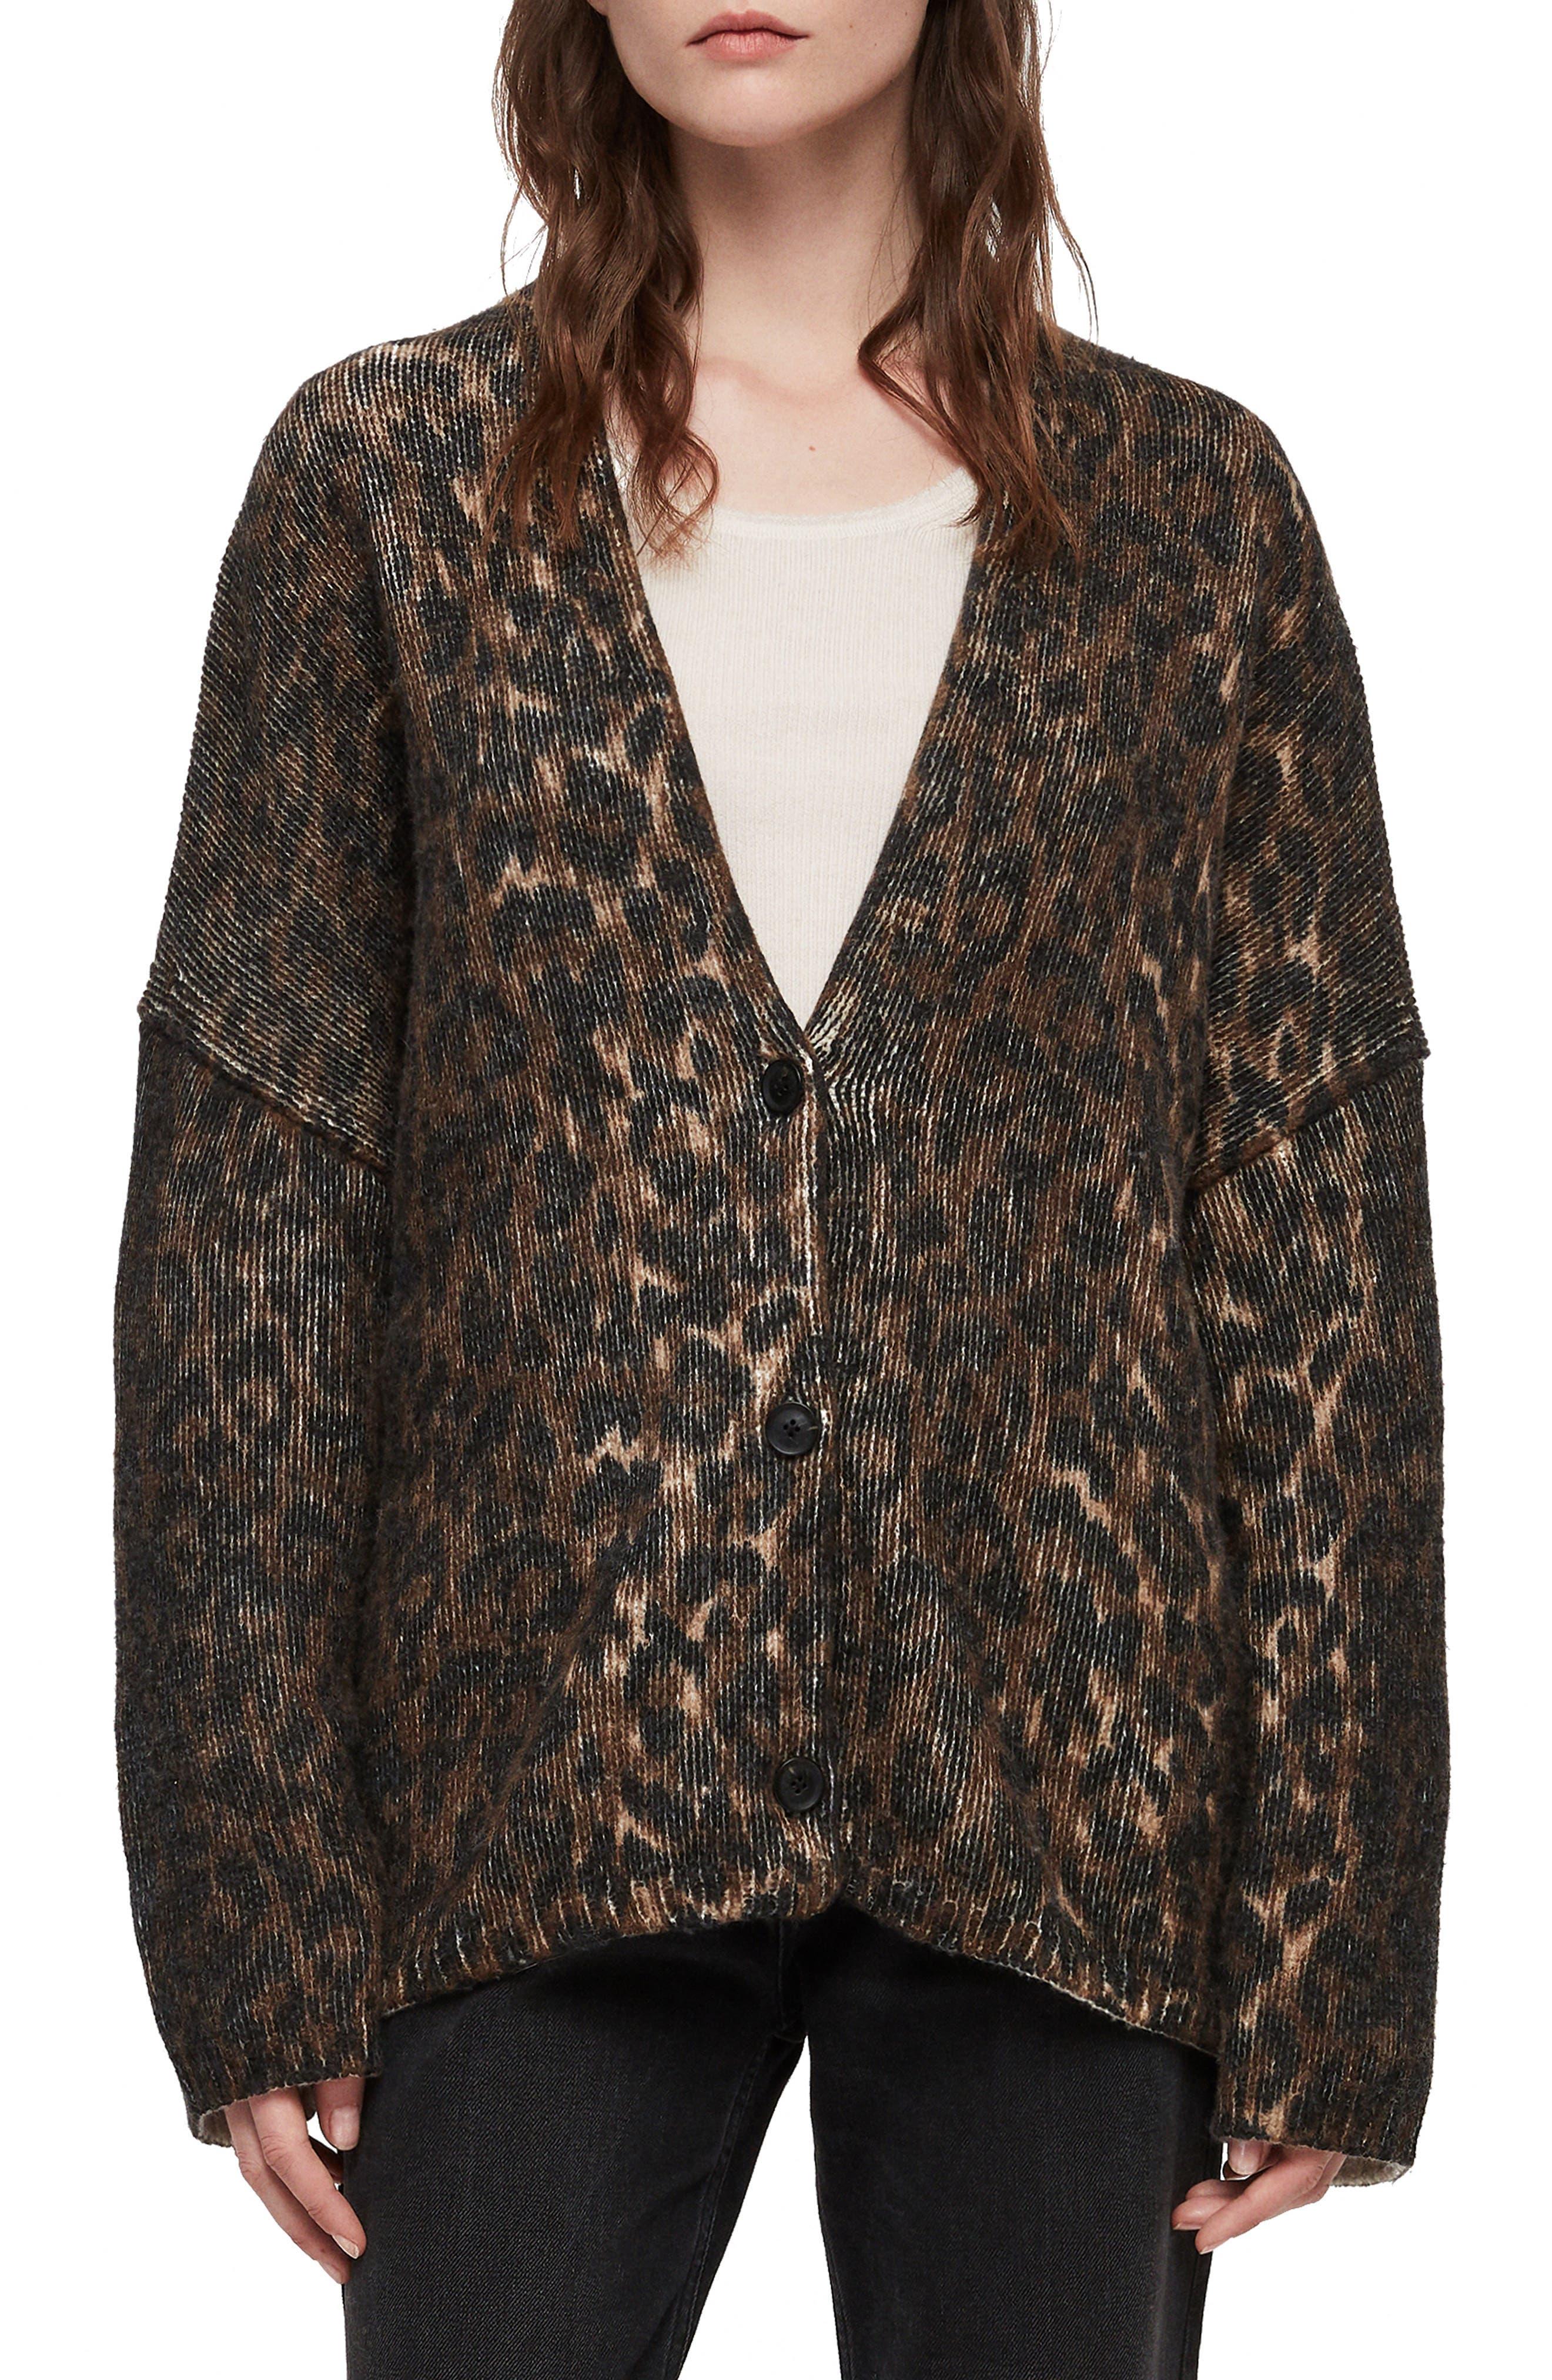 Ph Leopard Wool Blend Cardigan,                             Main thumbnail 1, color,                             LEOPARD BROWN